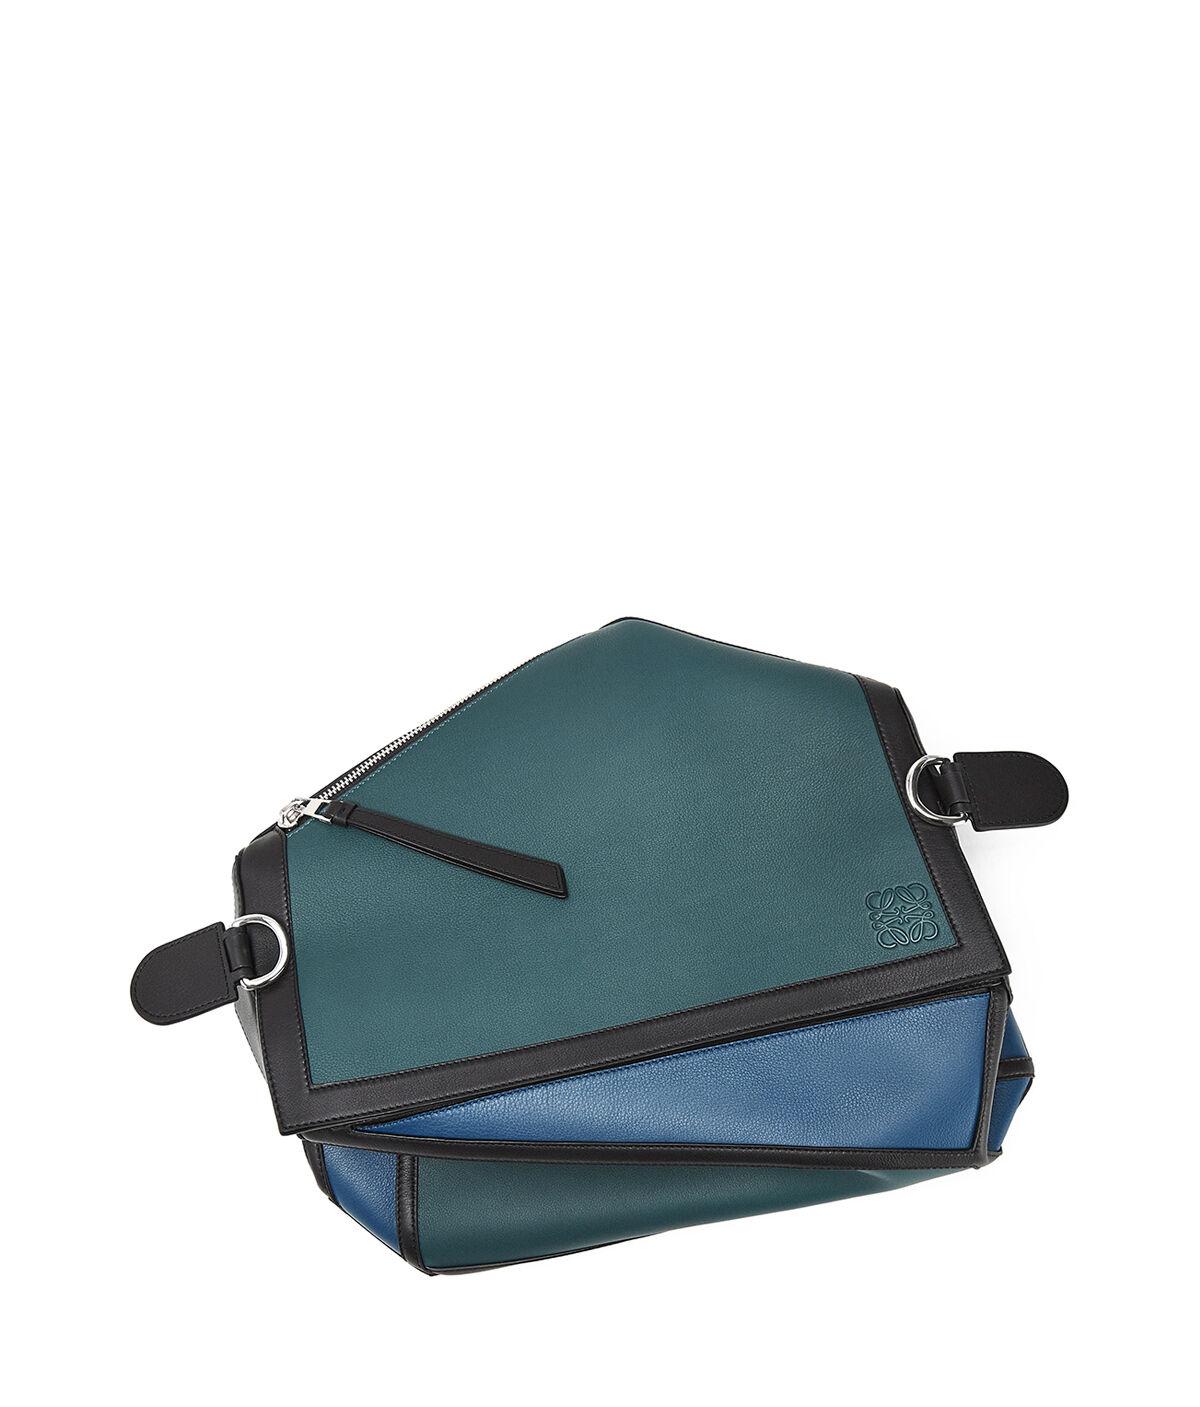 LOEWE Bolso Puzzle Graphic Xl Indigo/Azul Petroleo all